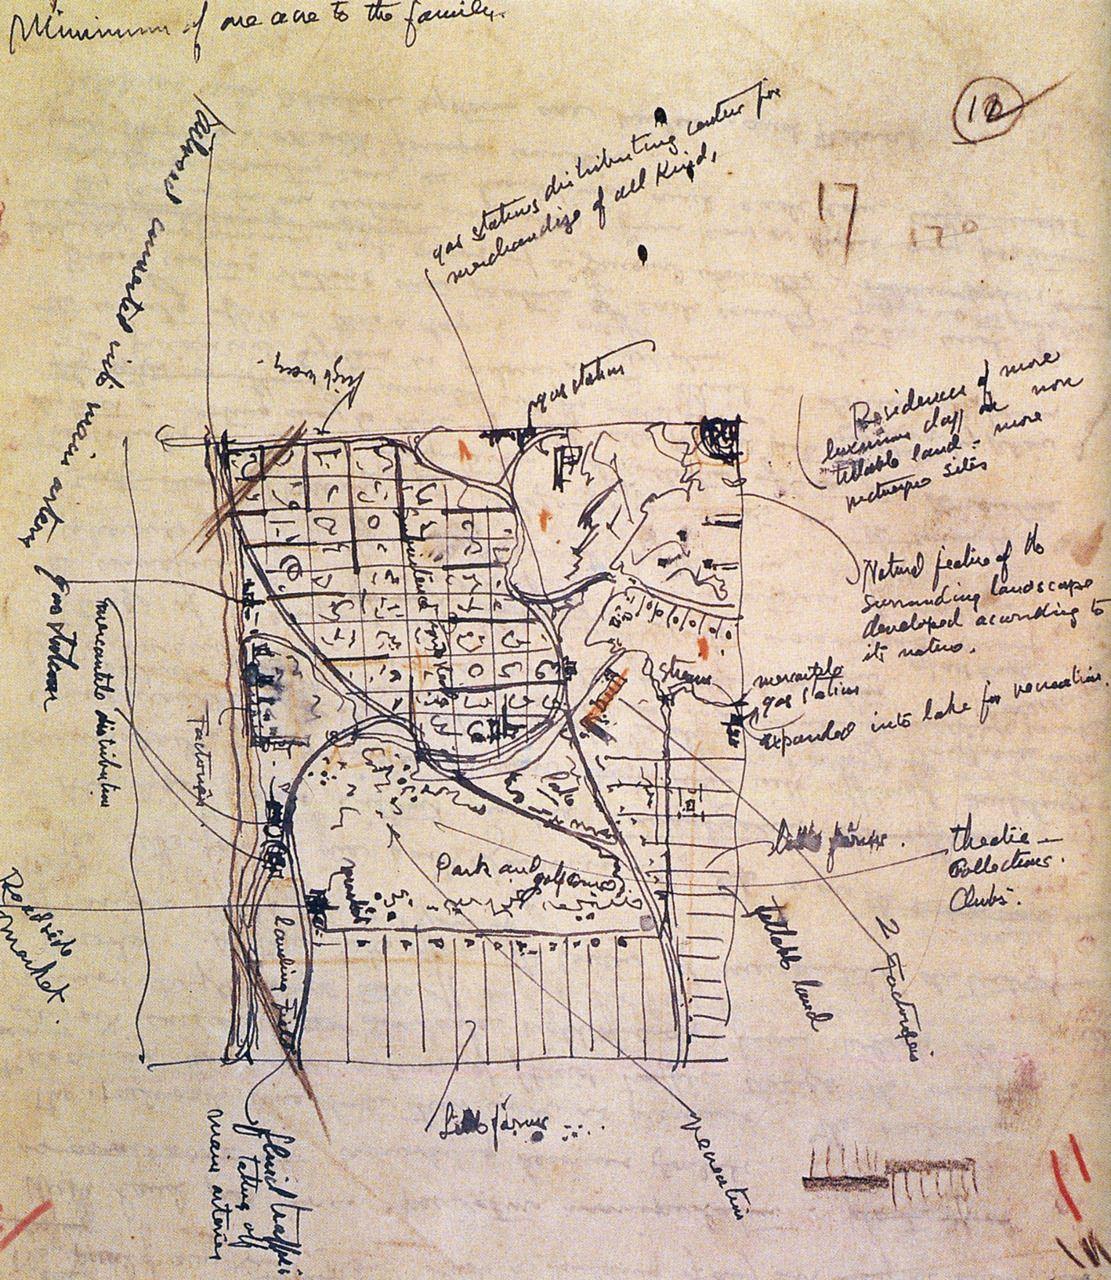 Frank Lloyd Wright Broadacre City Sketch 1934 35 City Sketch Frank Lloyd Wright Lloyd Wright